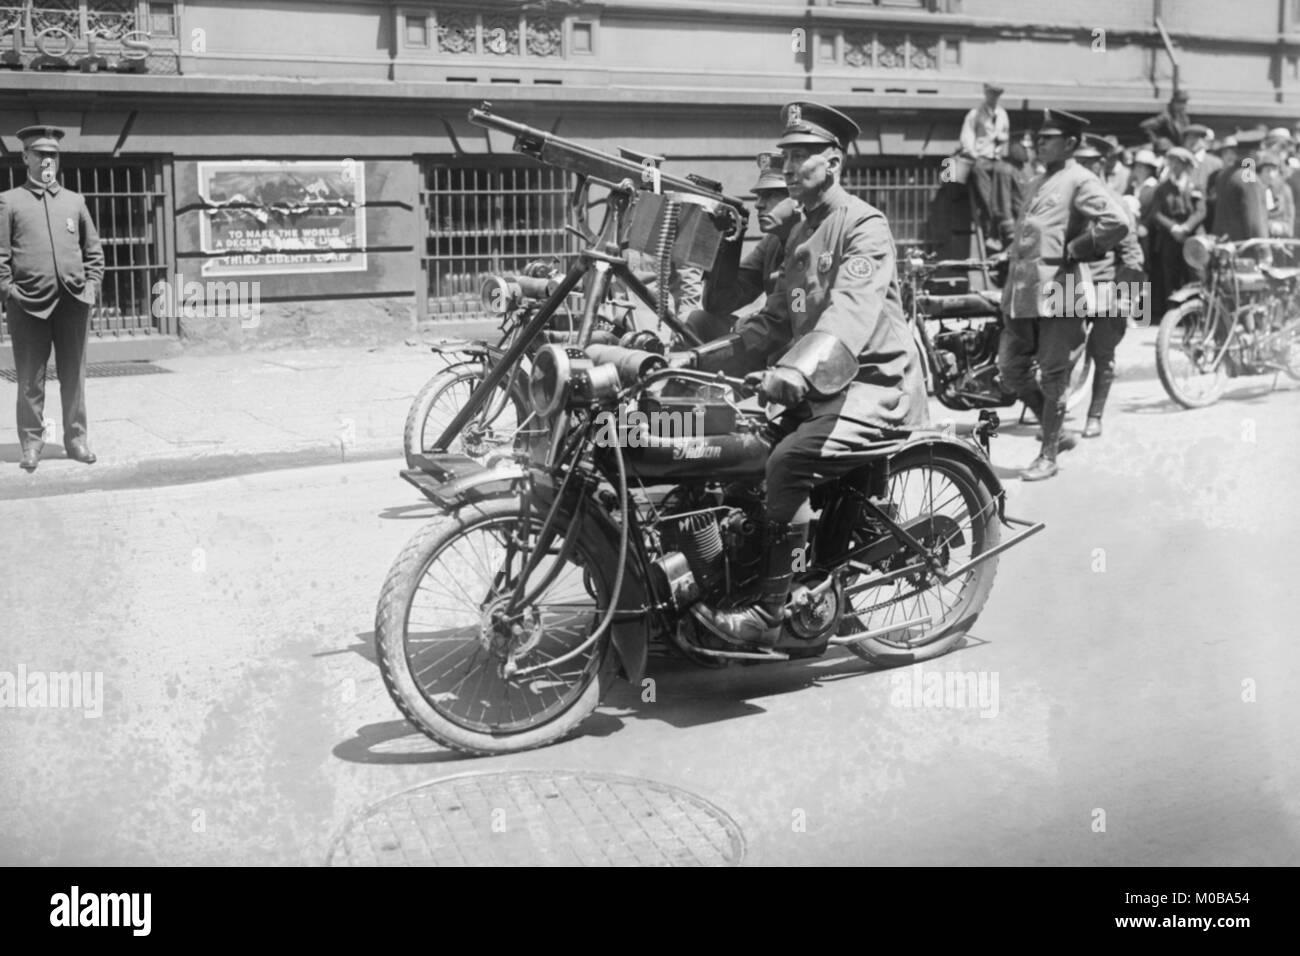 Moto Police Mobile Machine Gun Photo Stock